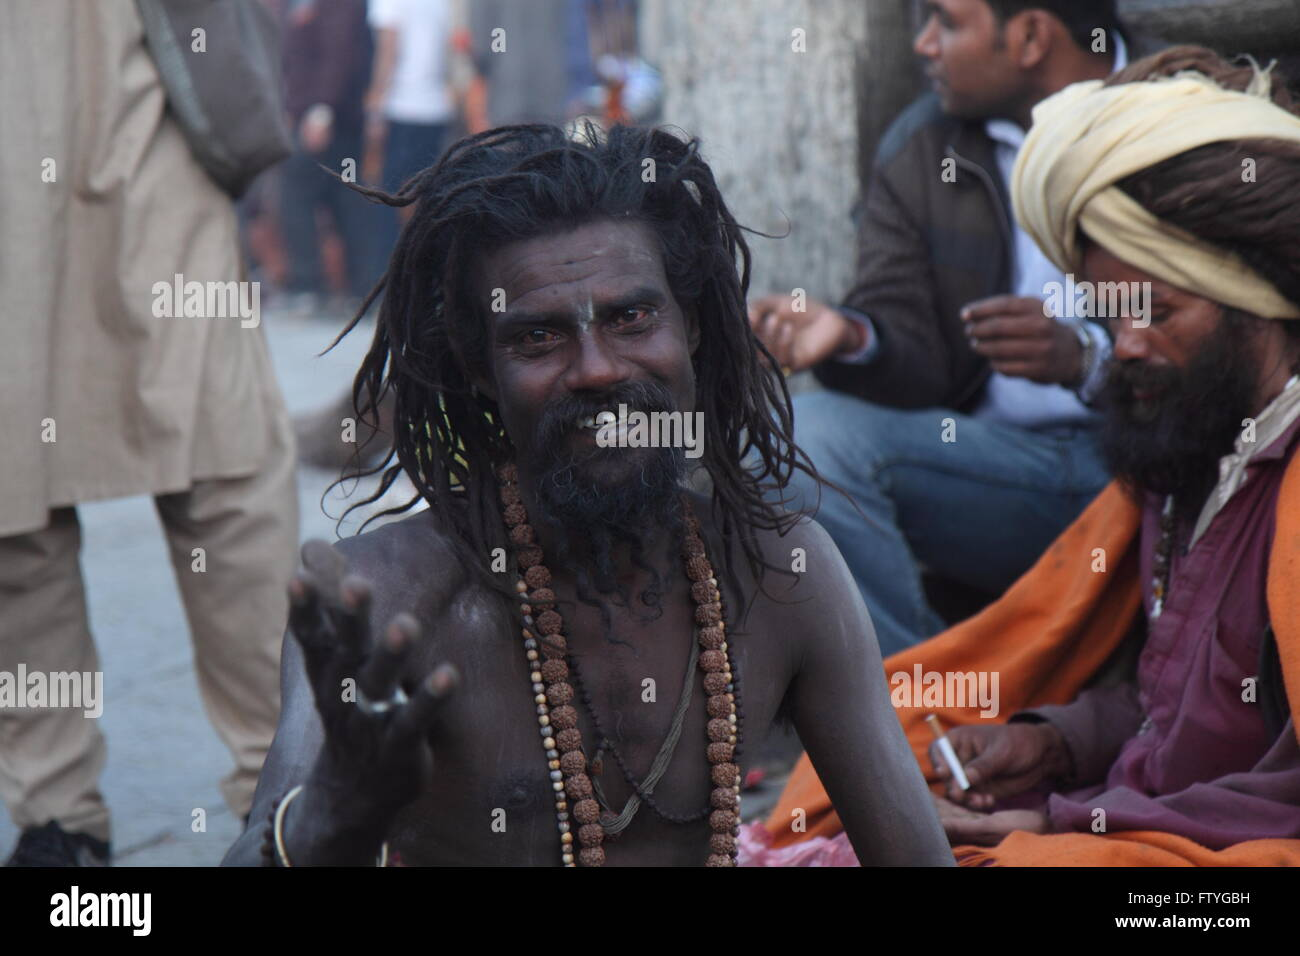 Hindu pilgrim during a Hindu festival, Shivarati at World heritage site- Pashupati, Nepal - Stock Image